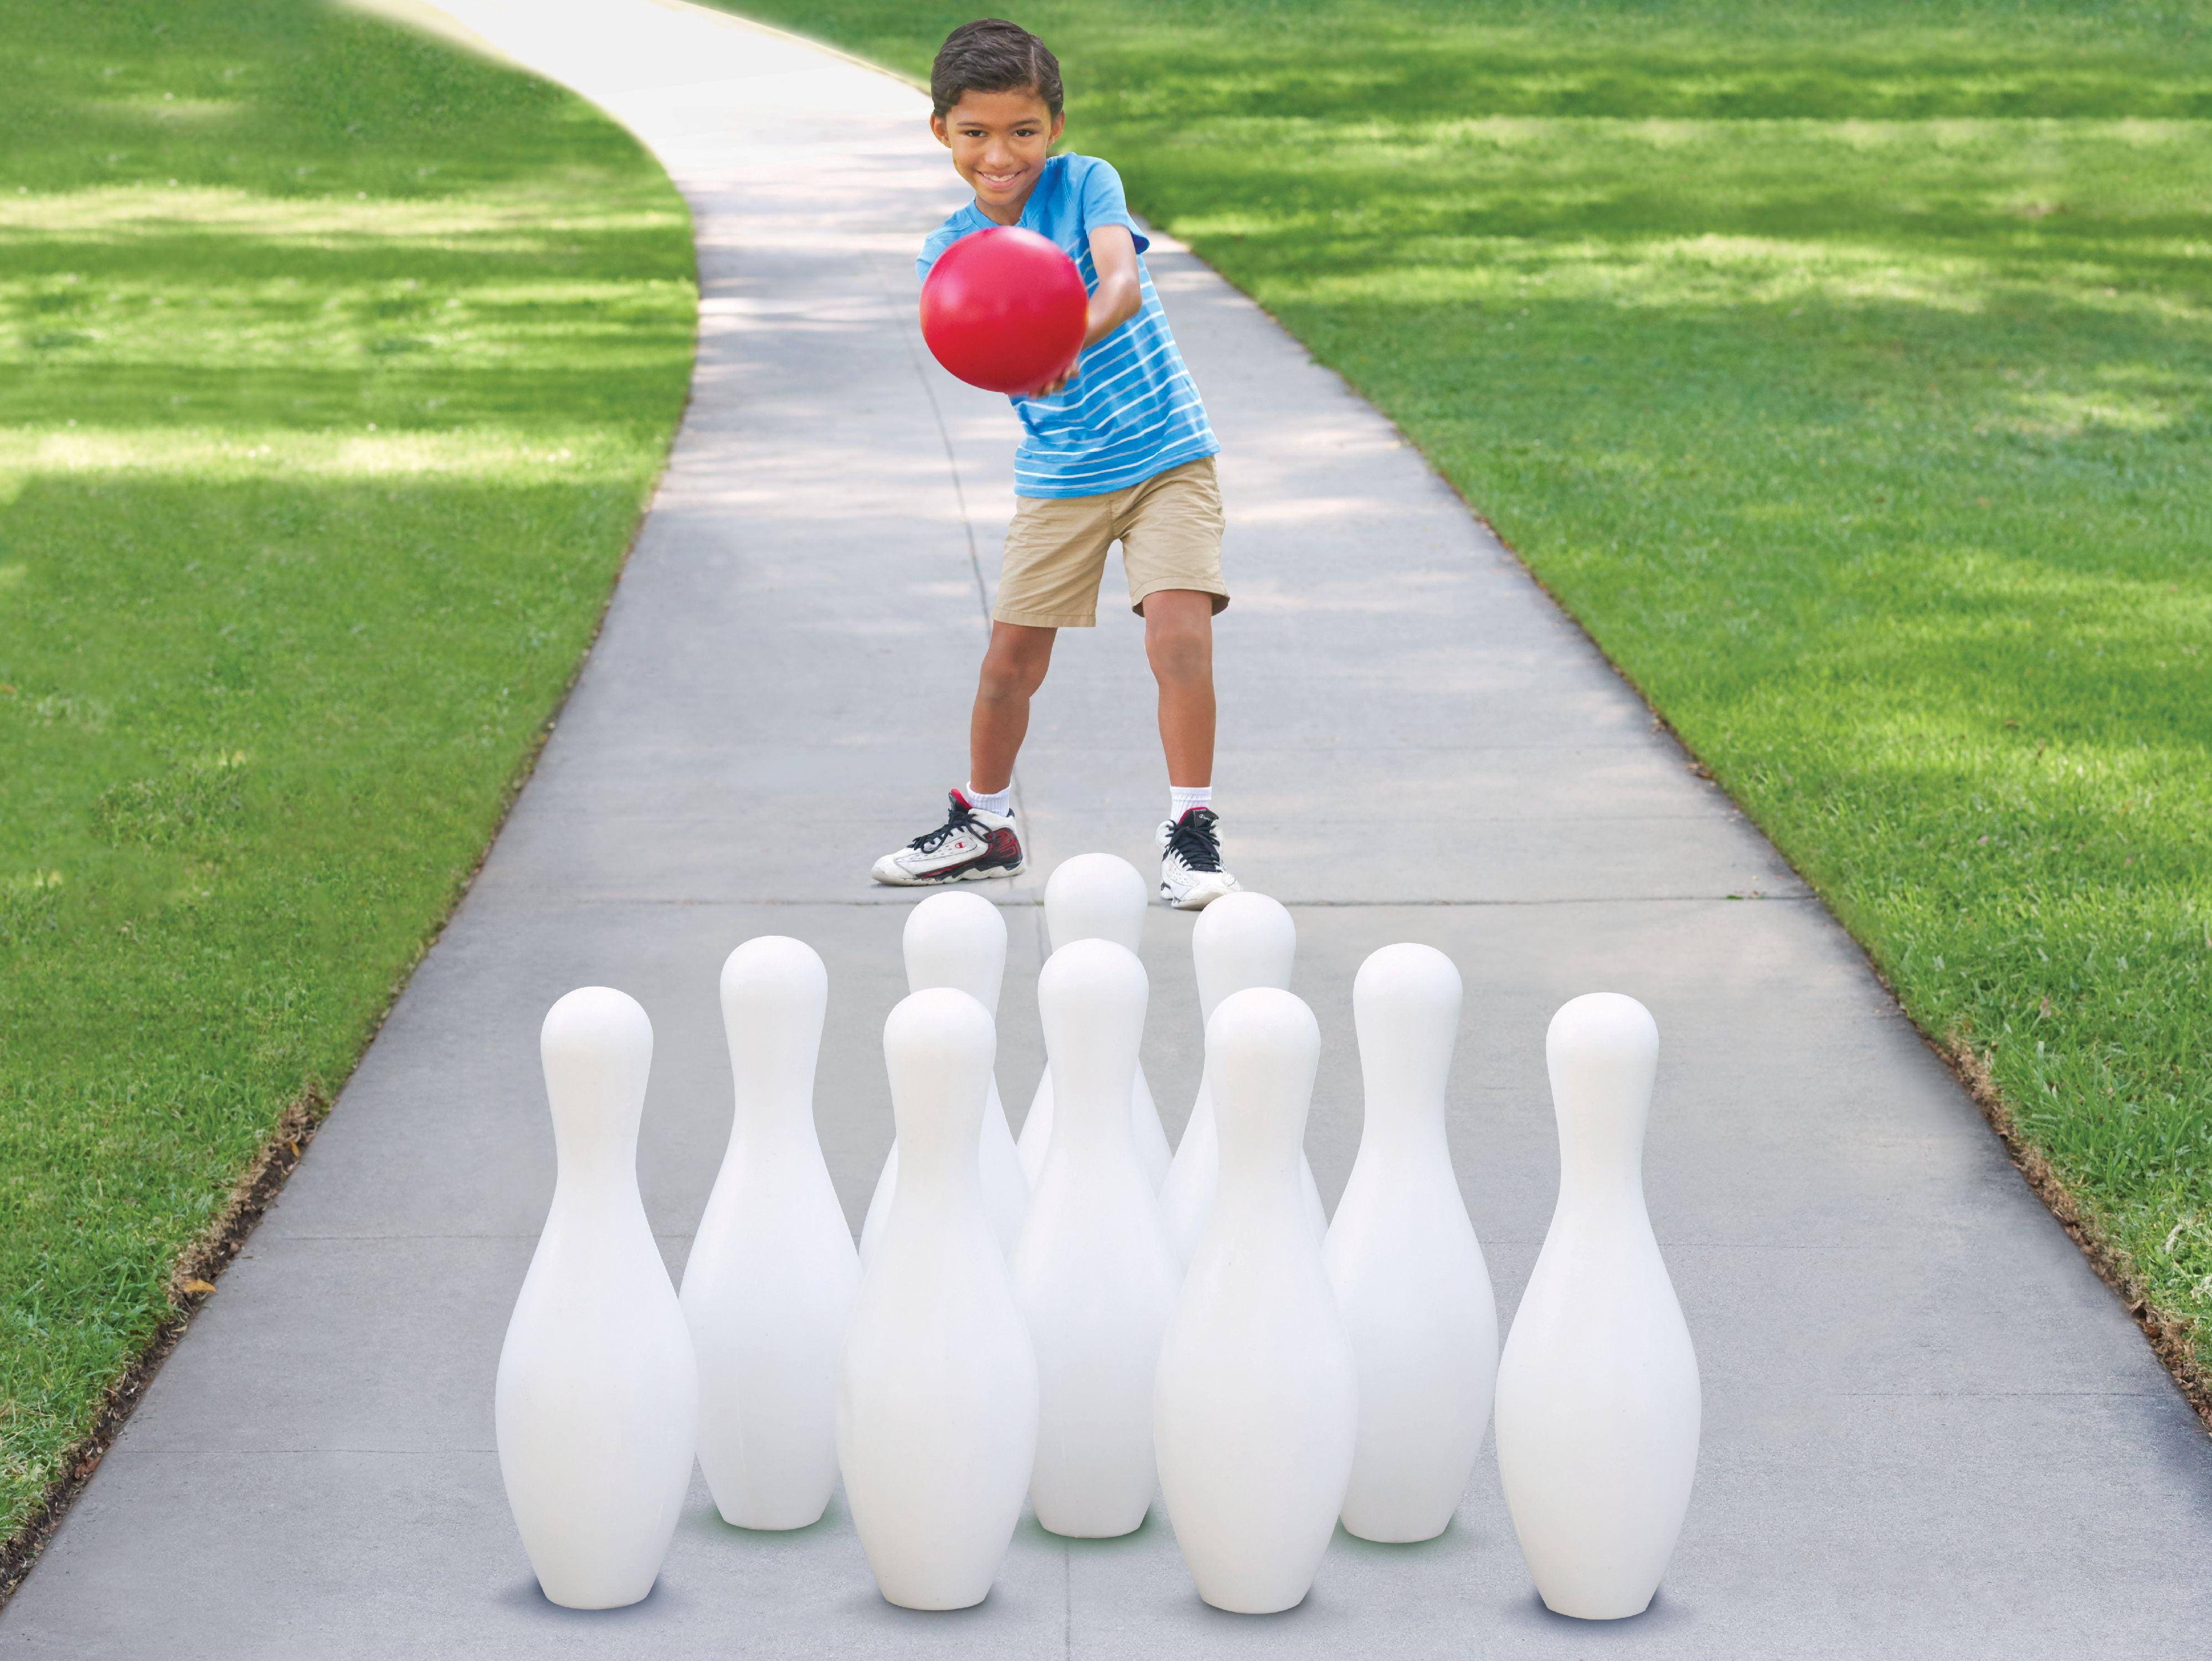 JUSTDOLIFE 12PCS Kids Bowling Set Interactive Bowling Game Bowling Pin with Bowling Ball